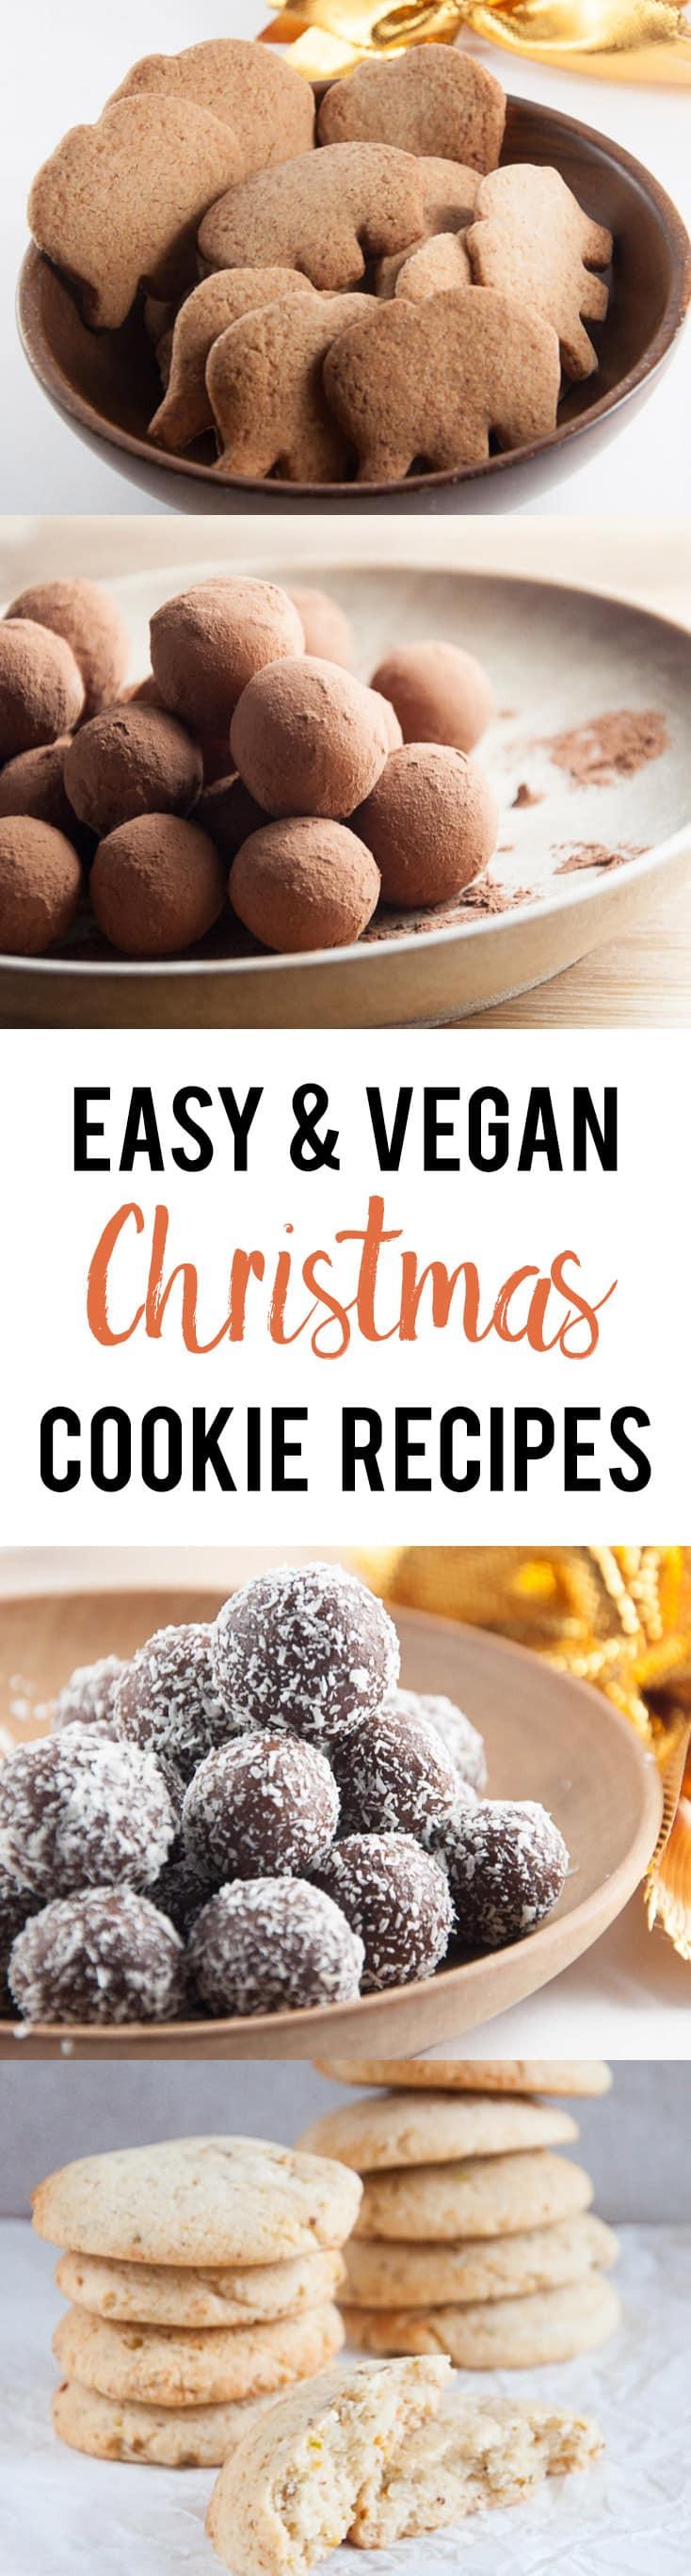 Vegan Christmas Cookie Recipes  10 Easy Vegan Christmas Cookie Recipes